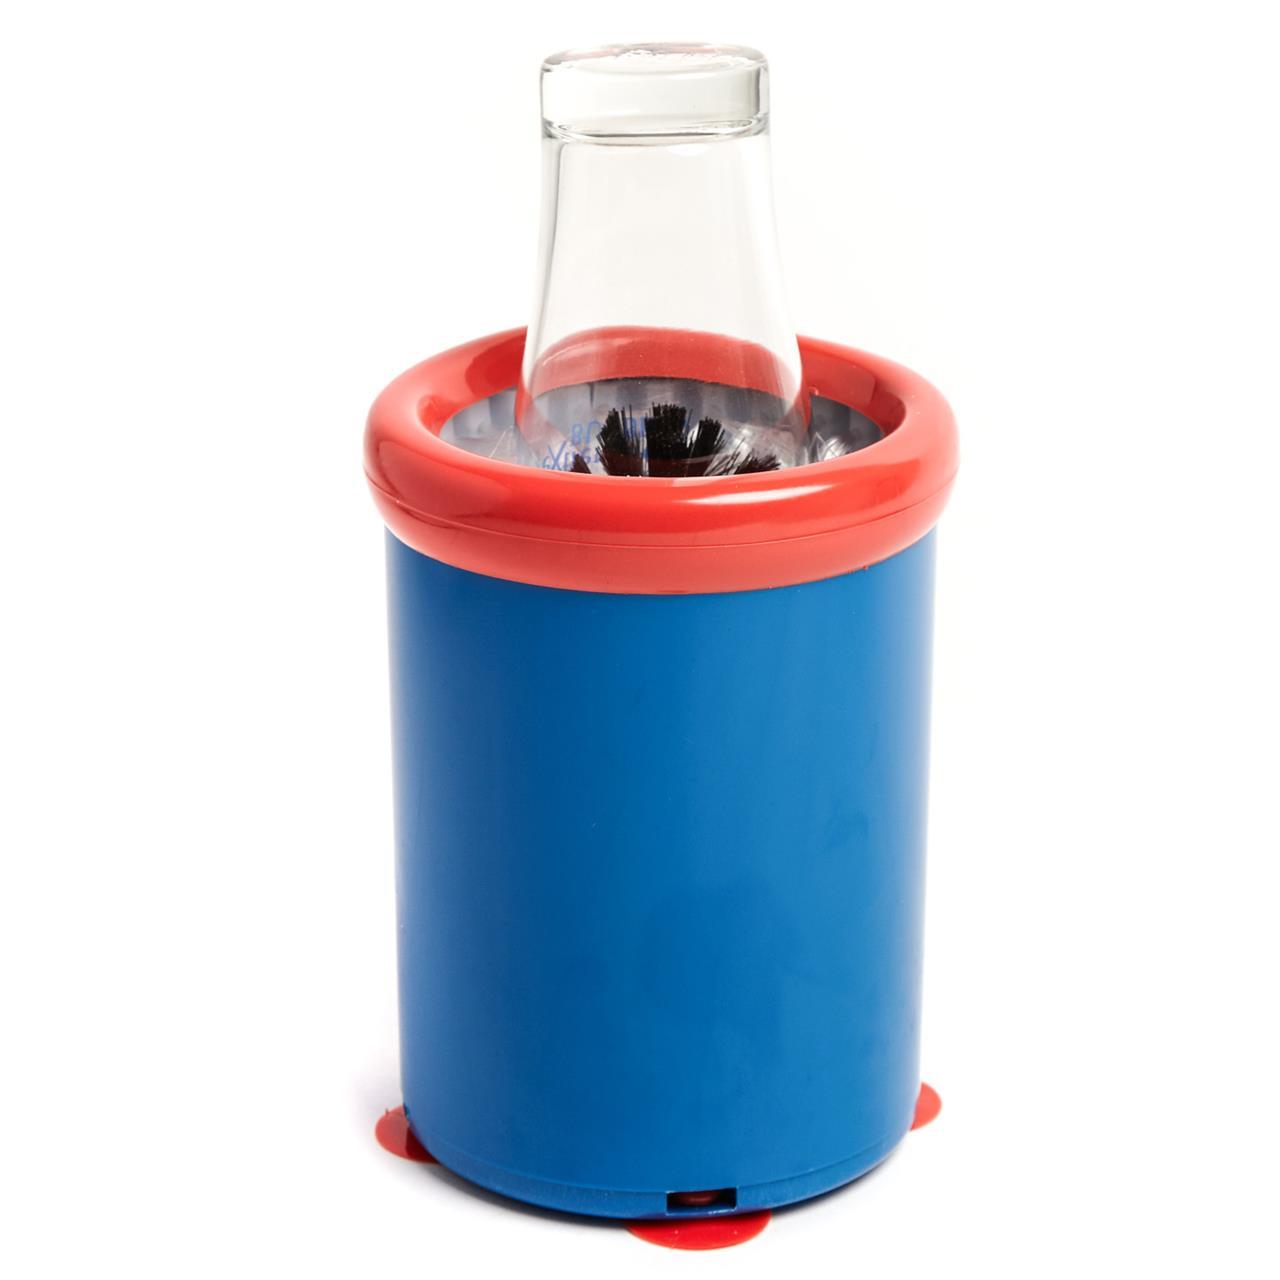 KH Glass Washer Blue